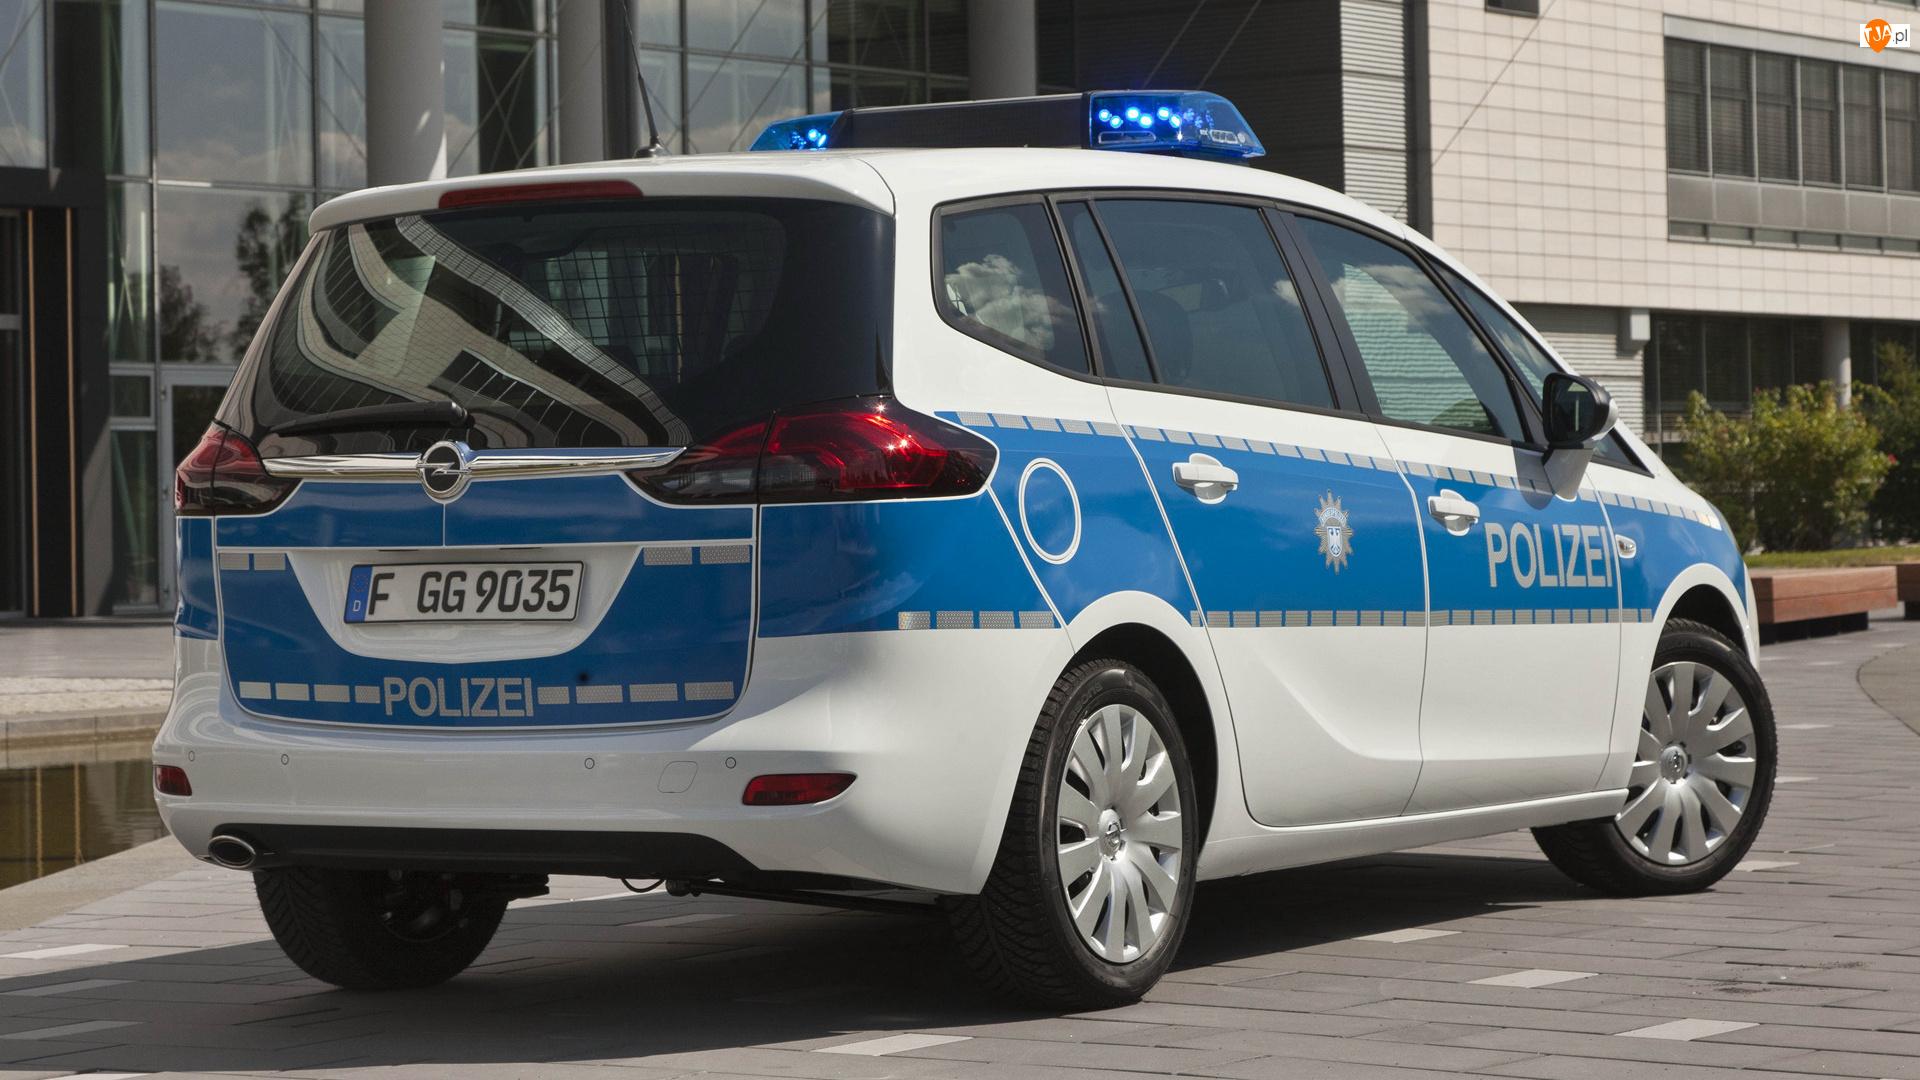 Policyjny, Opel Zafira